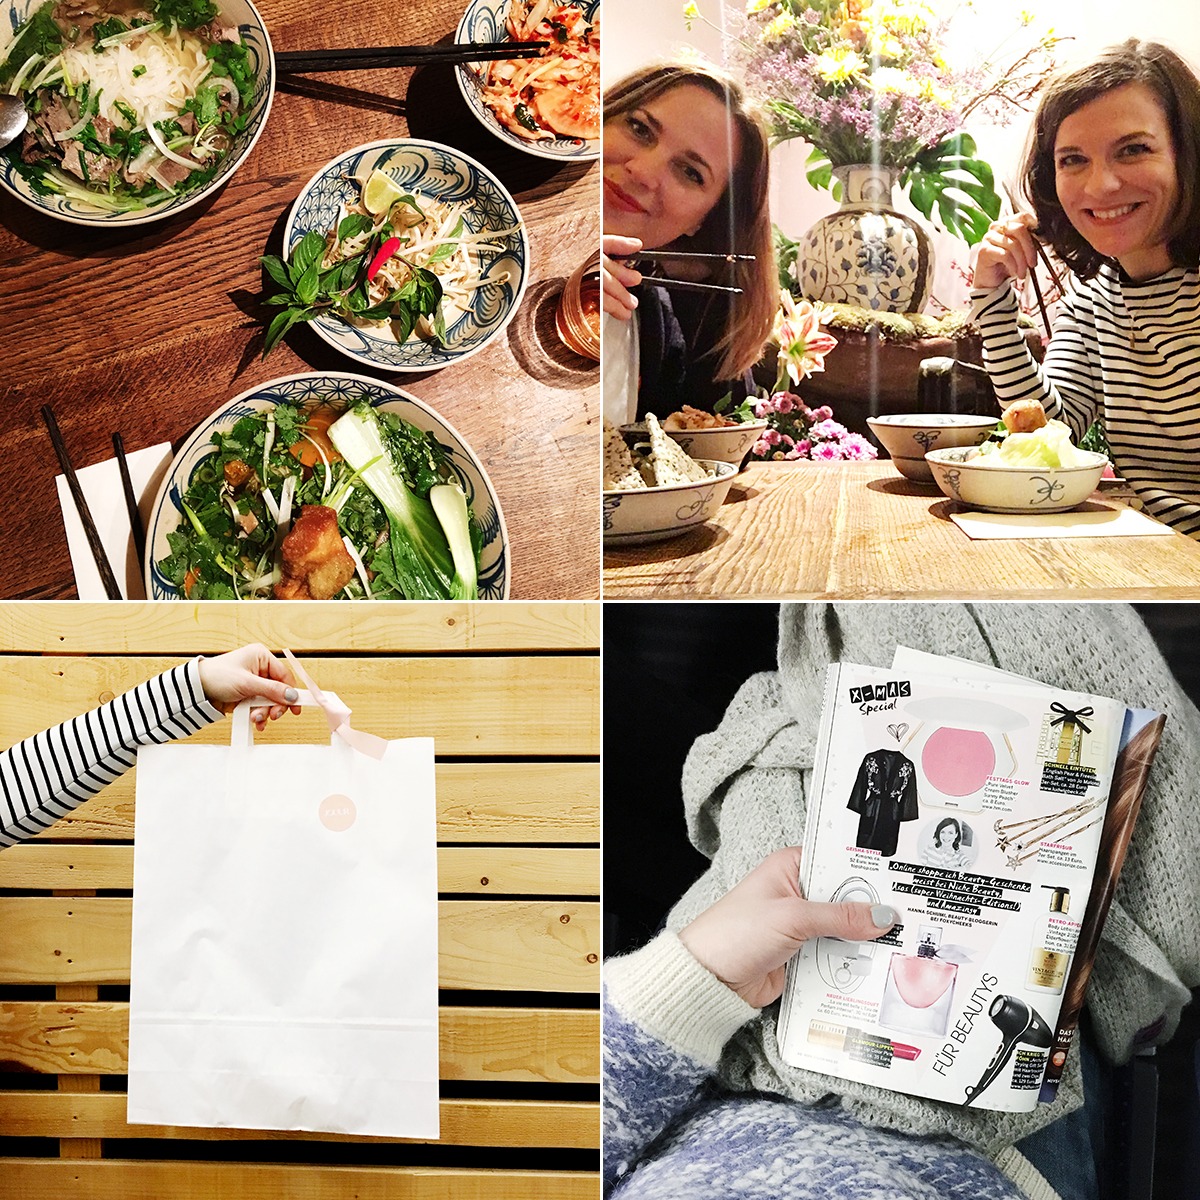 Foxys Diary Tagebuch | Hanna Schumi